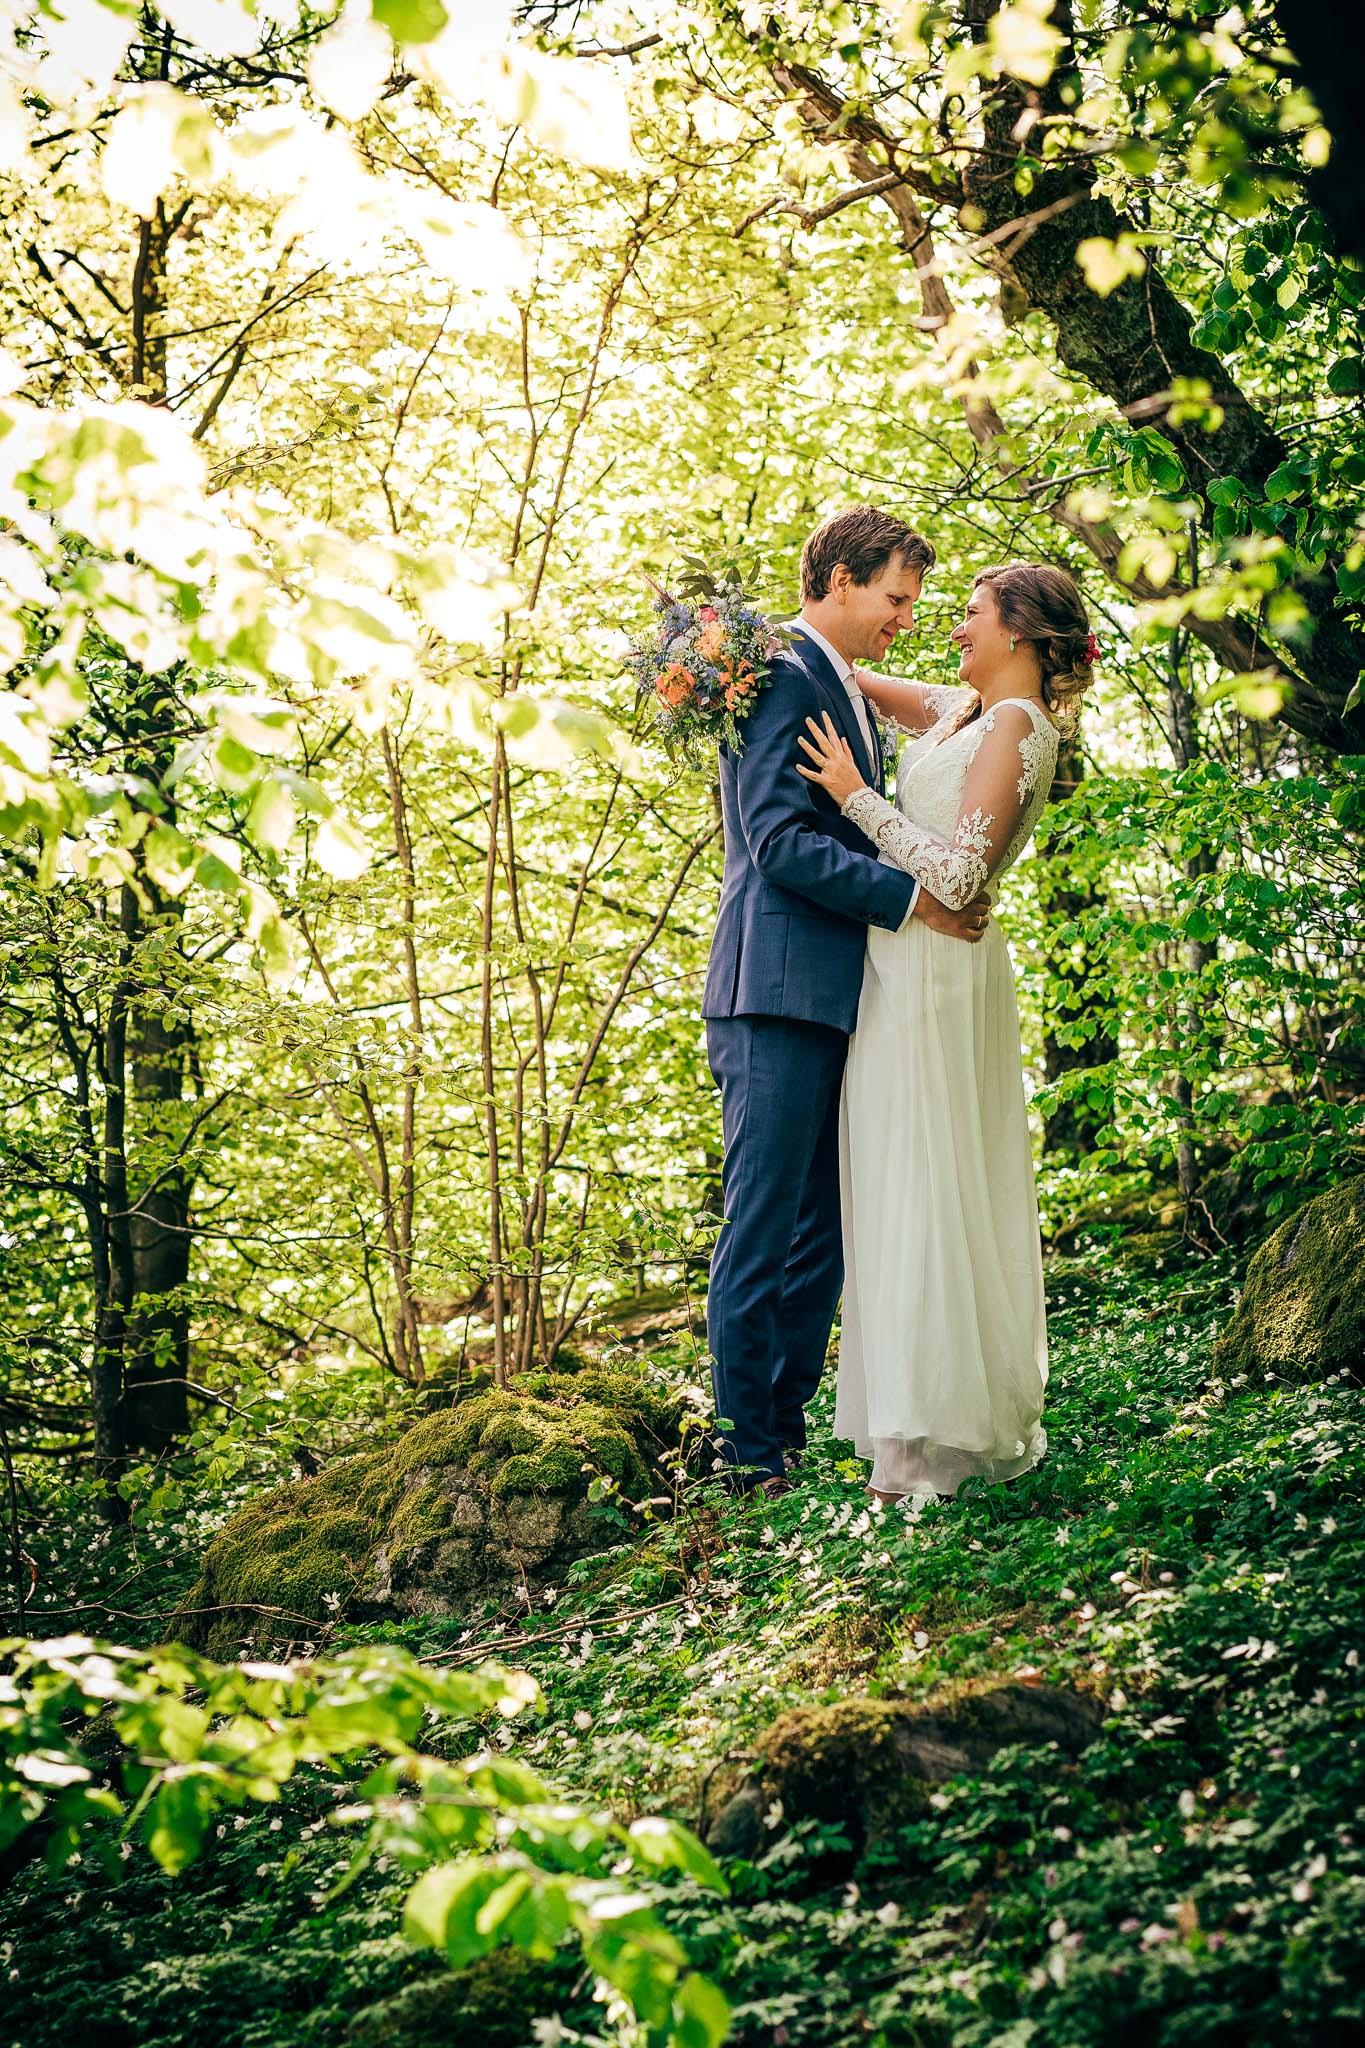 Wedding+Photographer+Norway+Bryllupsfotograf+Casey+Arneson+-90.jpg